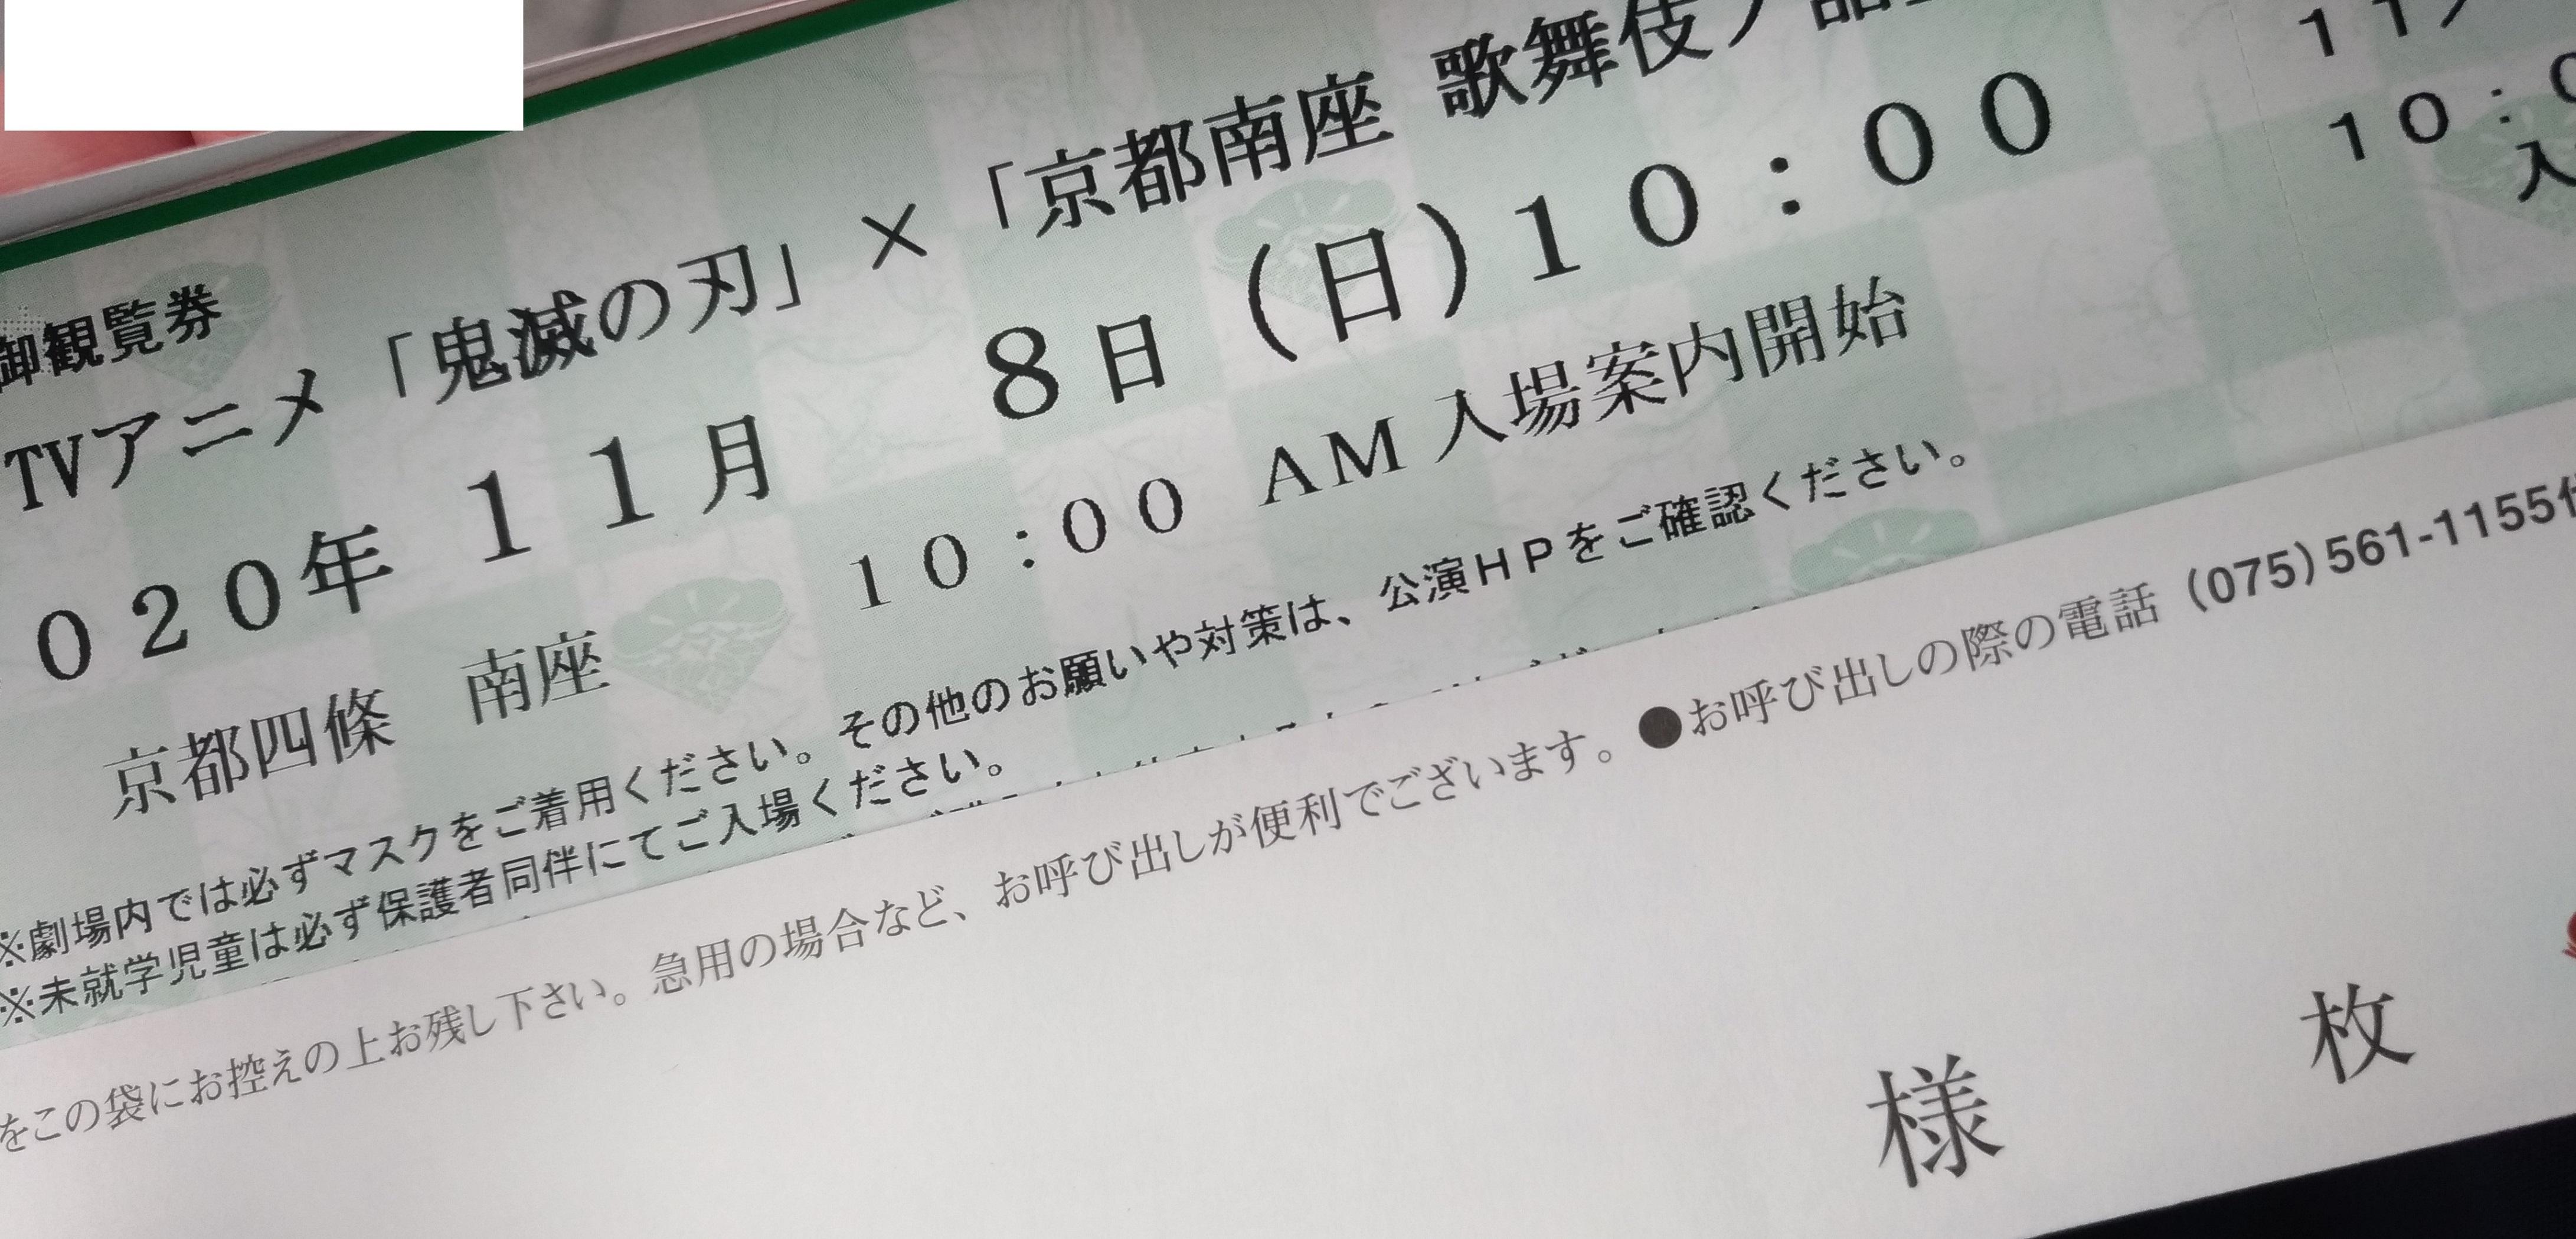 kimetsu_yaiba_1108_kyoto_minami_reviews_blogs_4.jpg